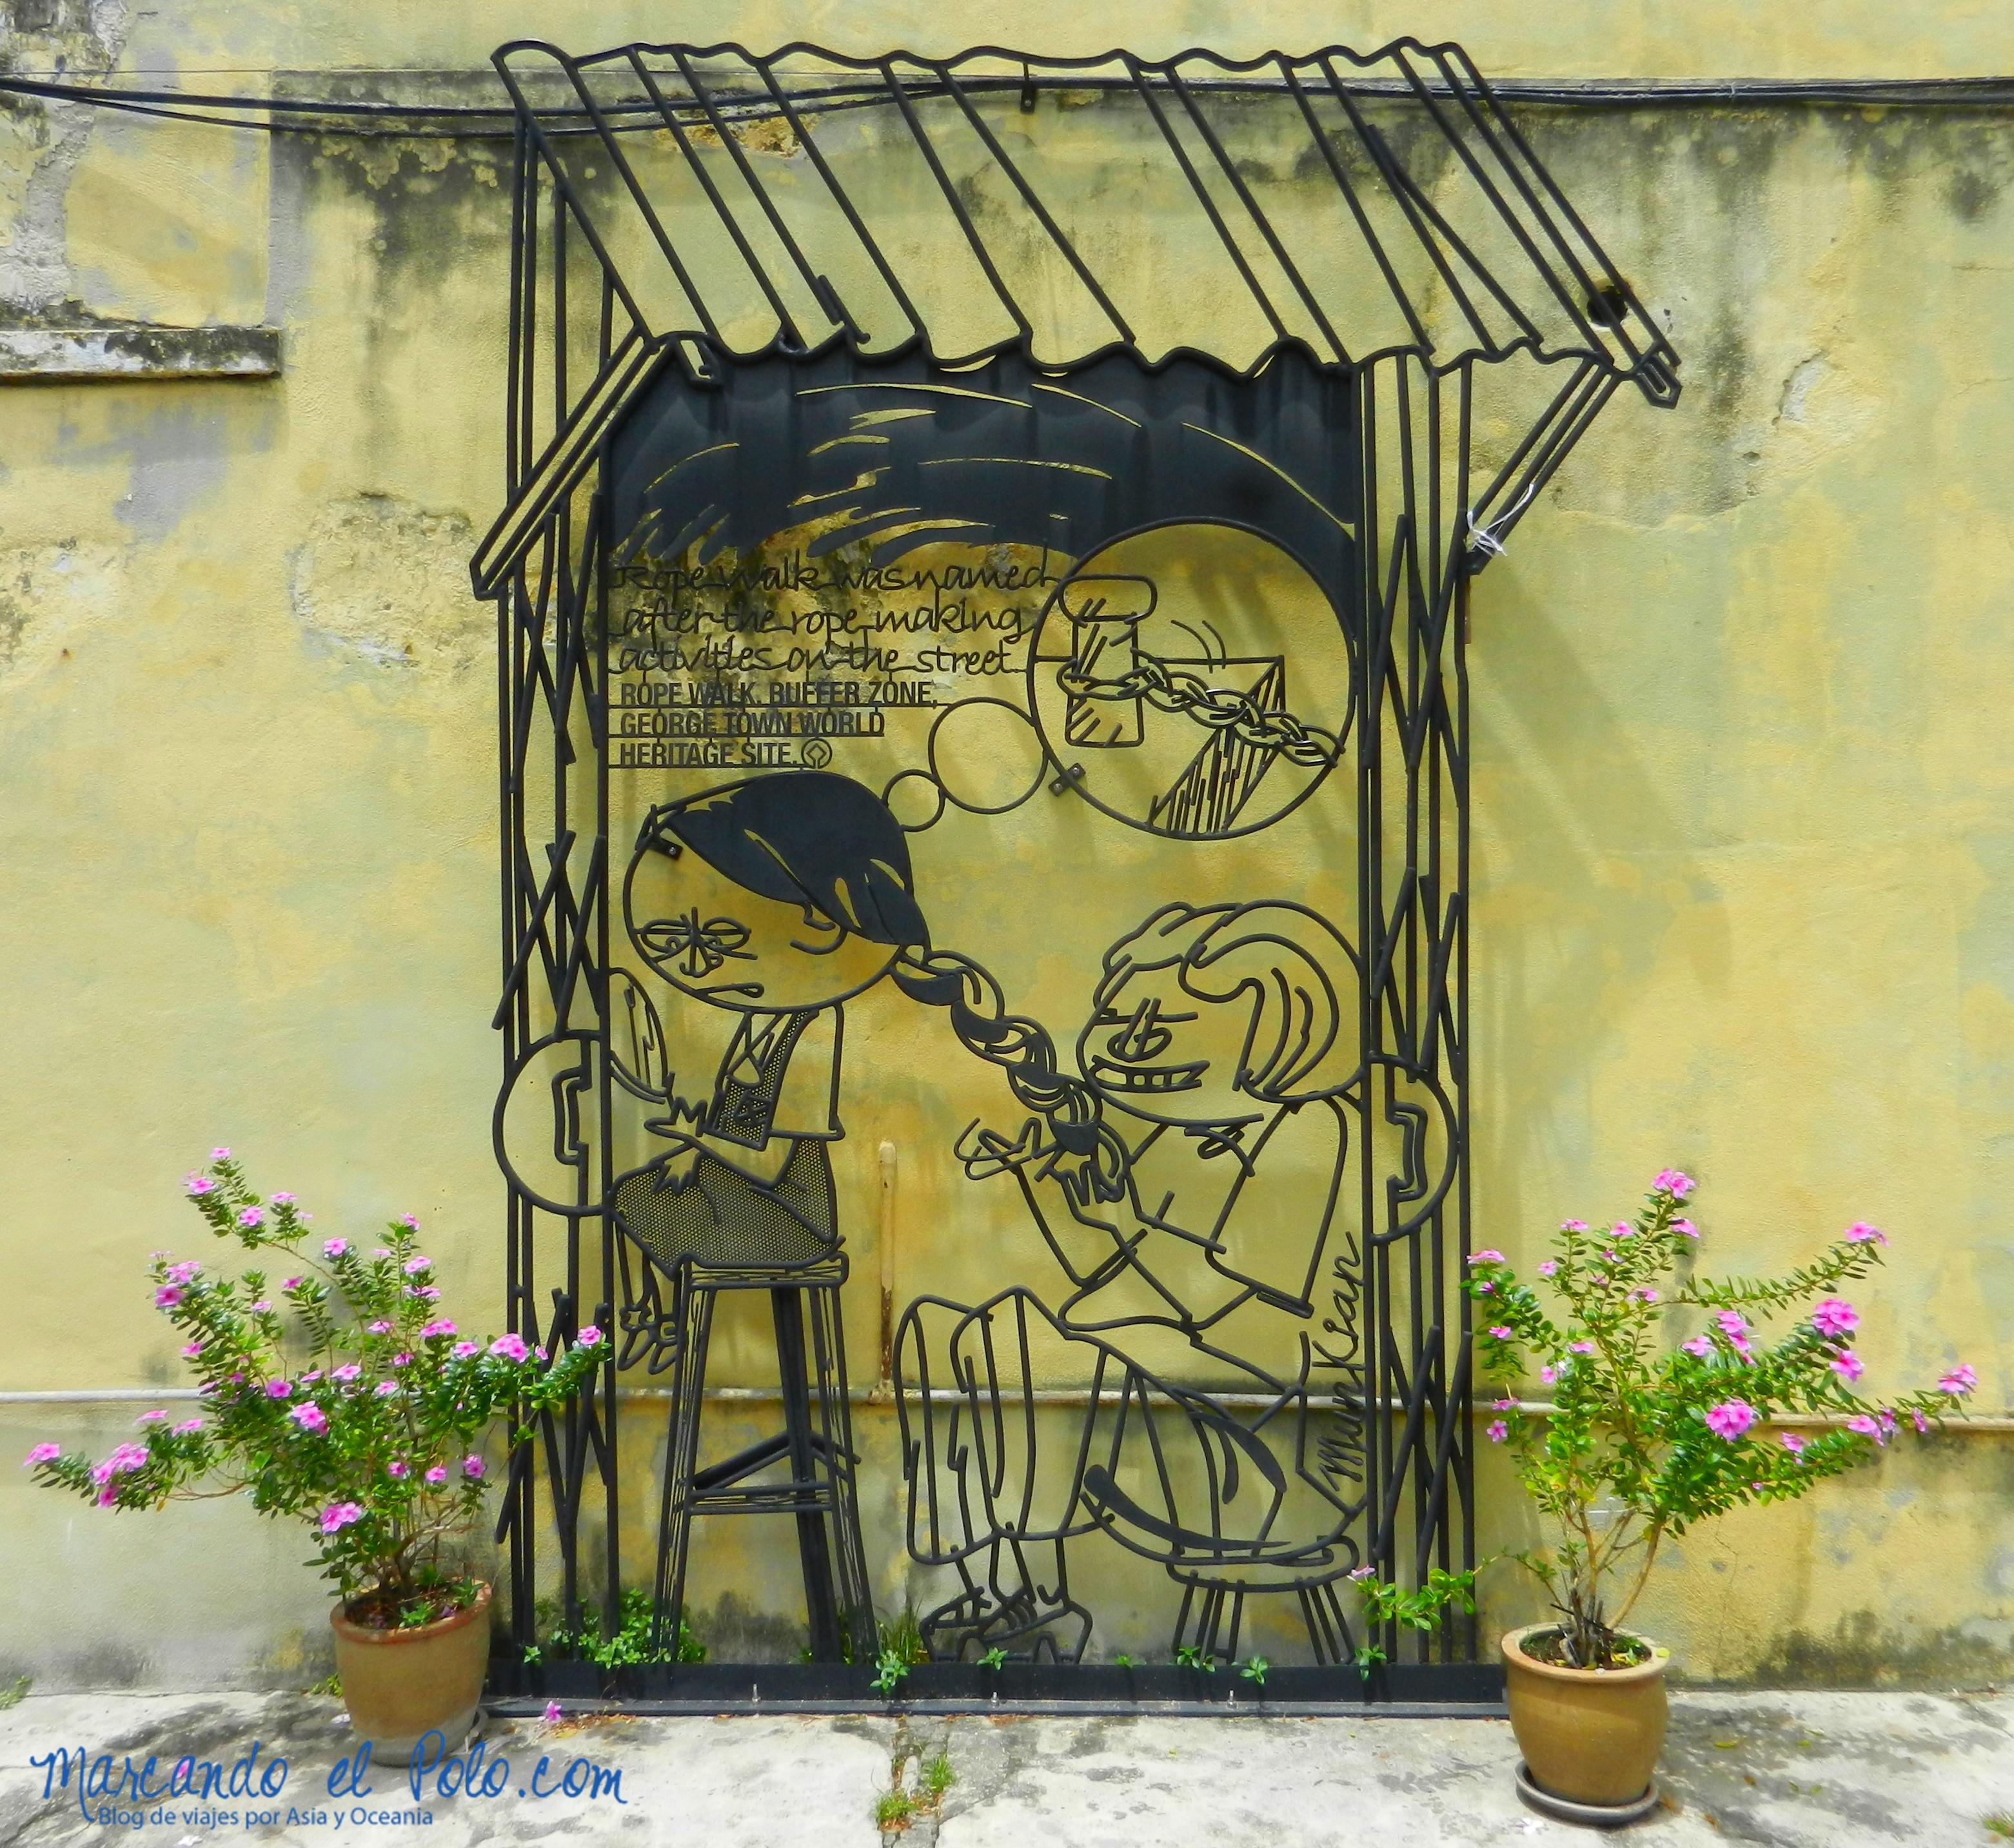 Arte callejero Penang, Malasia 11